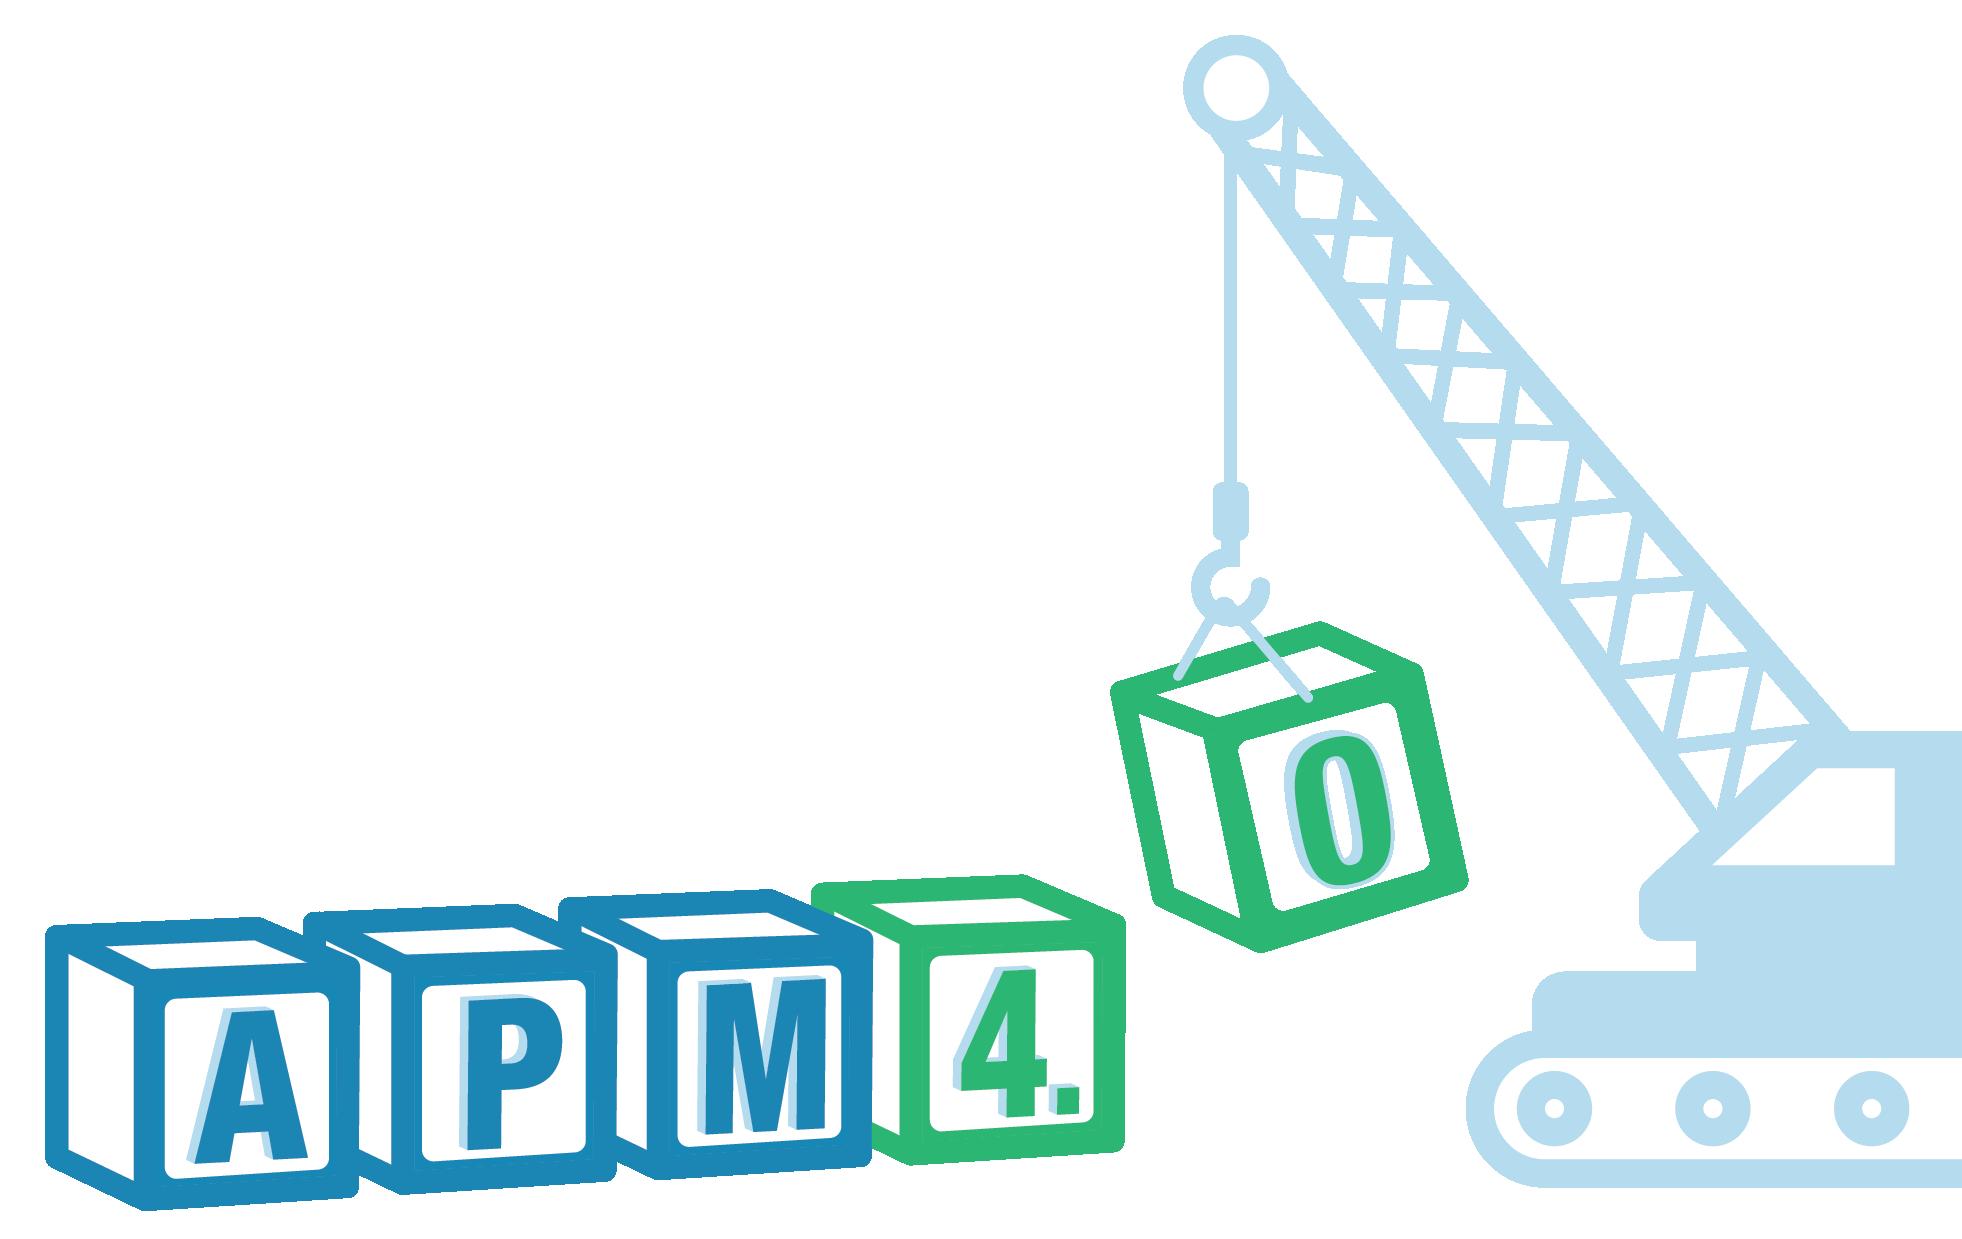 APM4_BuildingBlocks-1.png